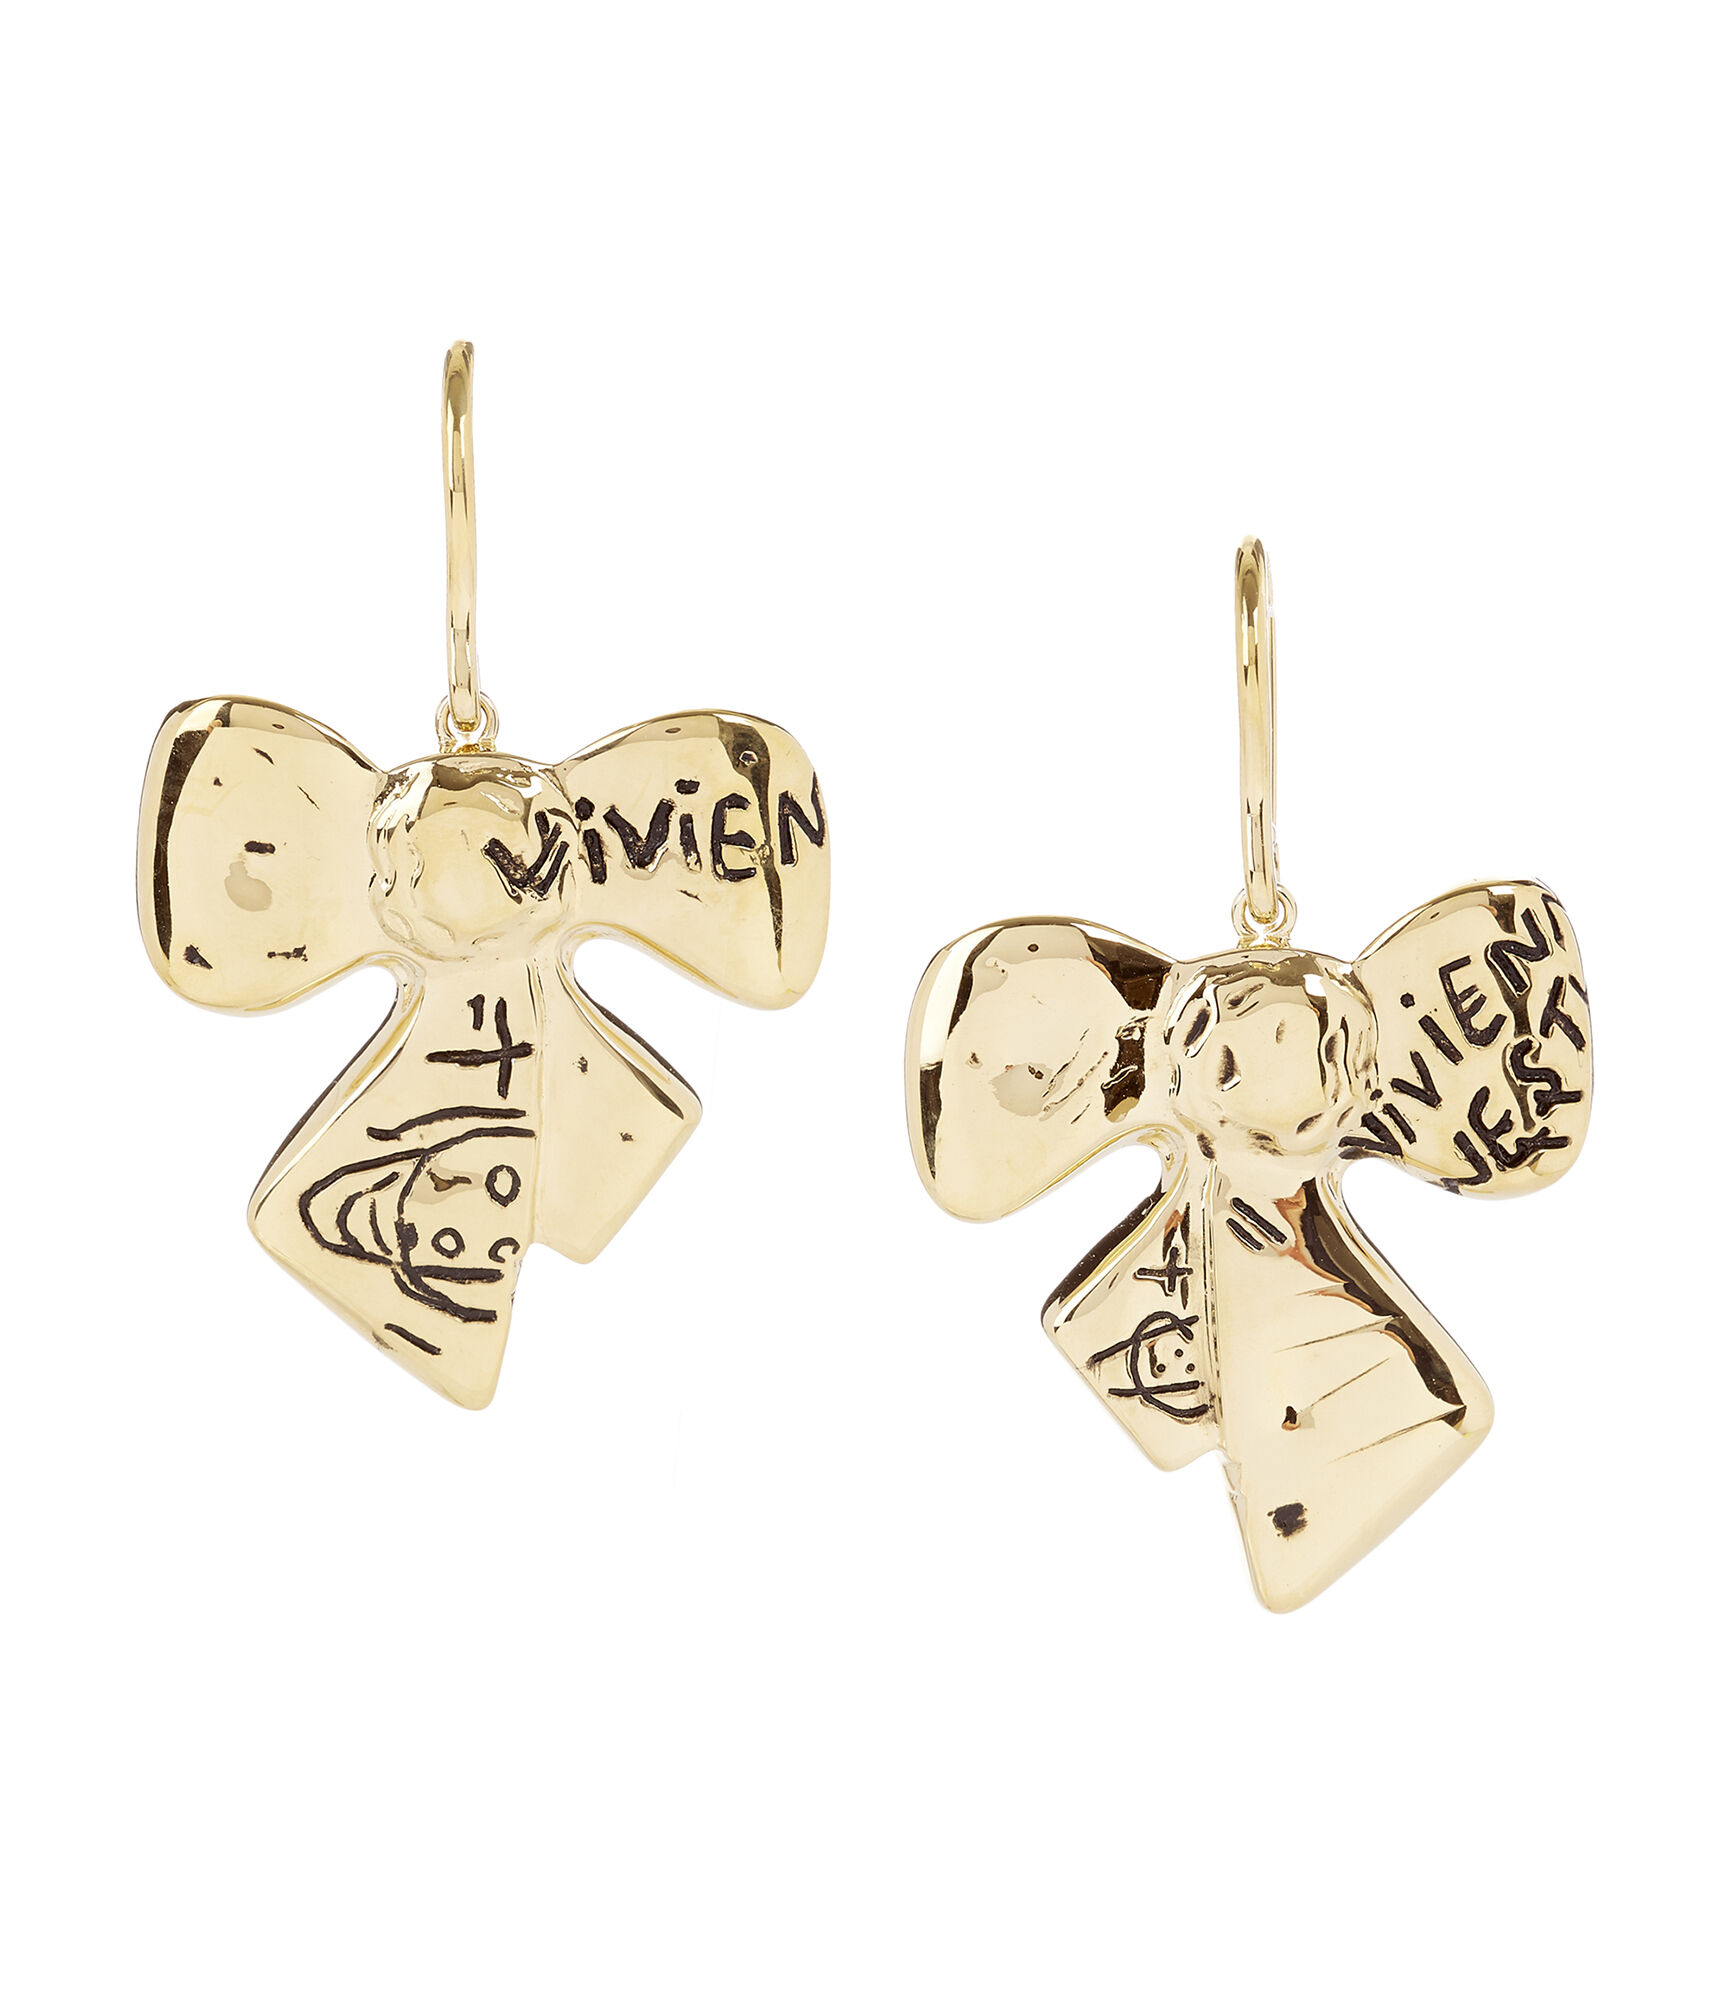 Vivienne Westwood Earrings for Women, Gold, 2017, One Size